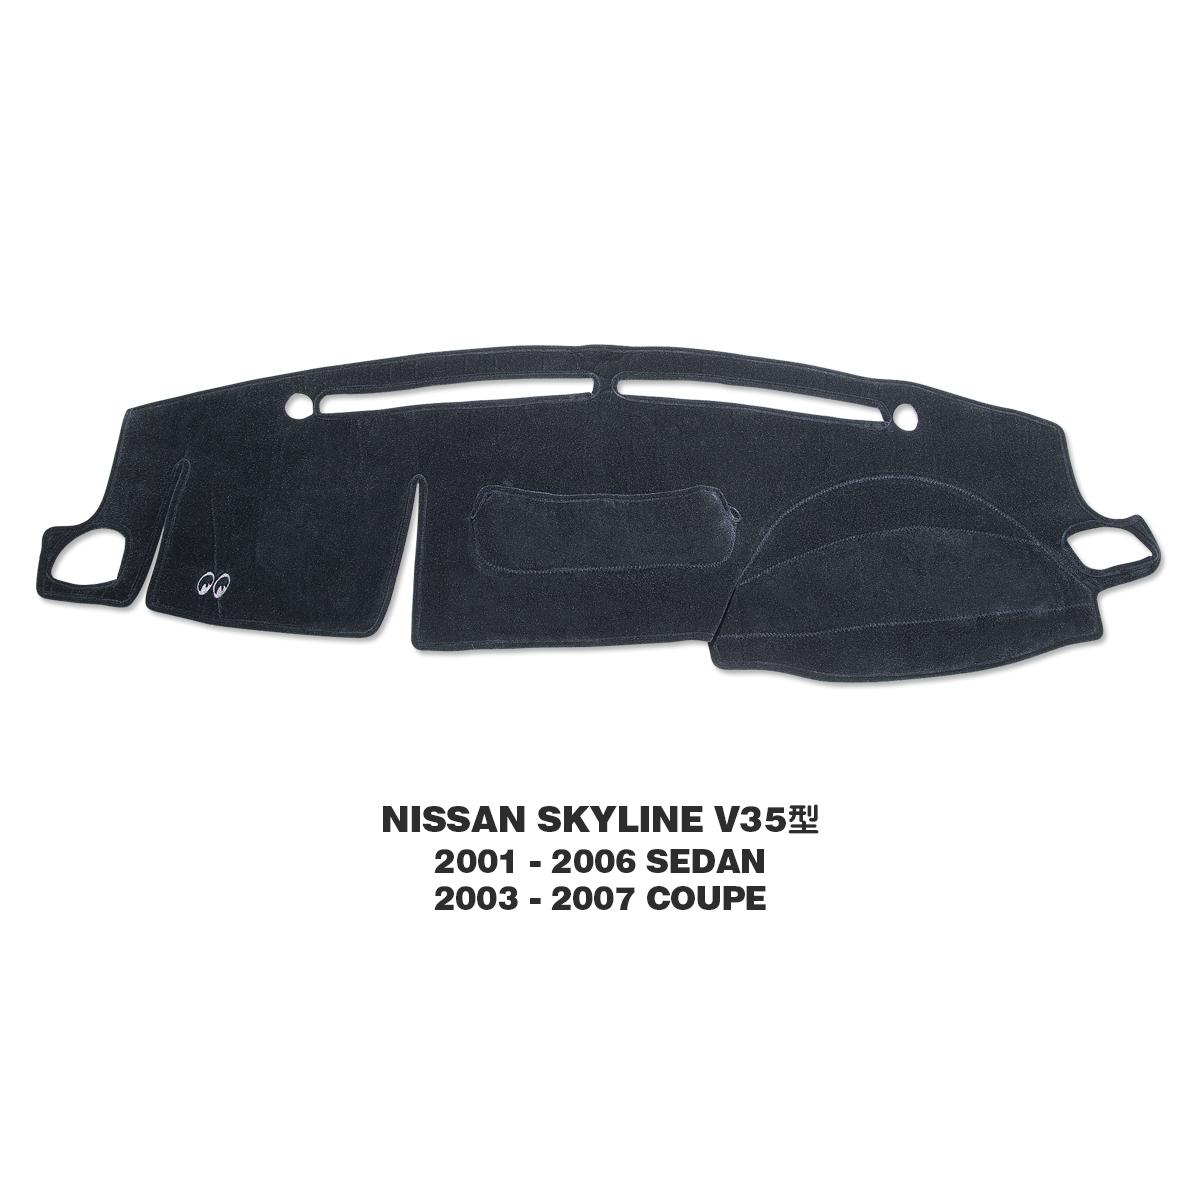 NISSAN SKYLINE V35型 (日産 スカイライン) 2001年-2006年 セダン / 2003年-2007年 クーペ用 オリジナル DASH MAT(ダッシュマット)